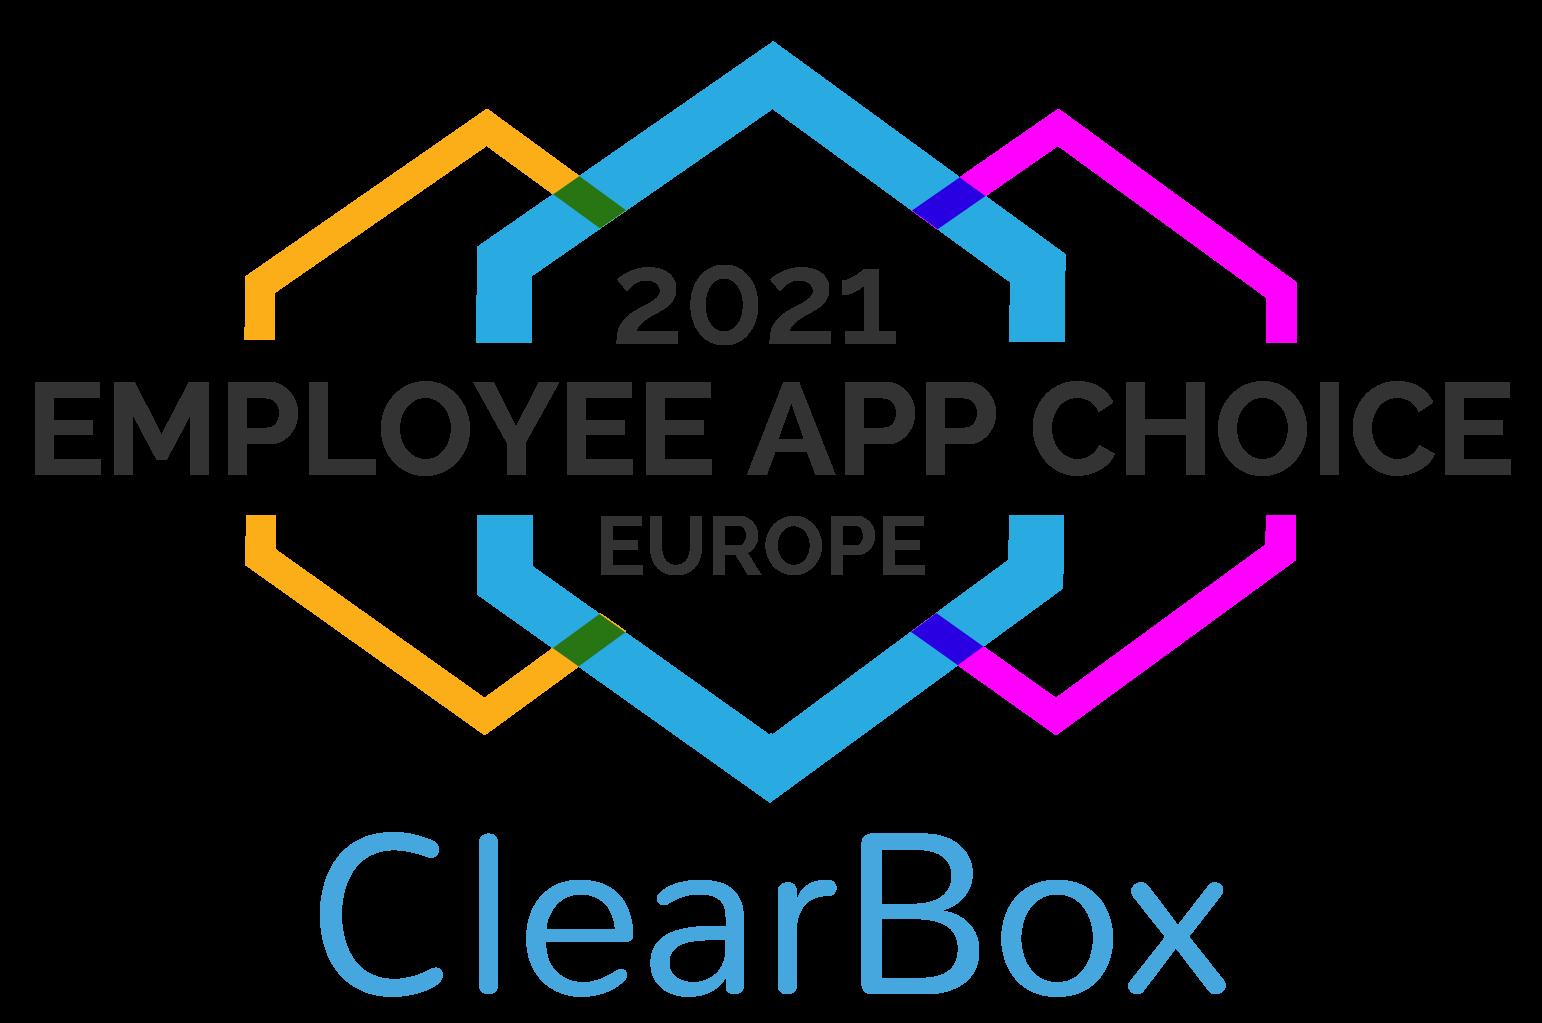 Employee app choice Europe 2021.